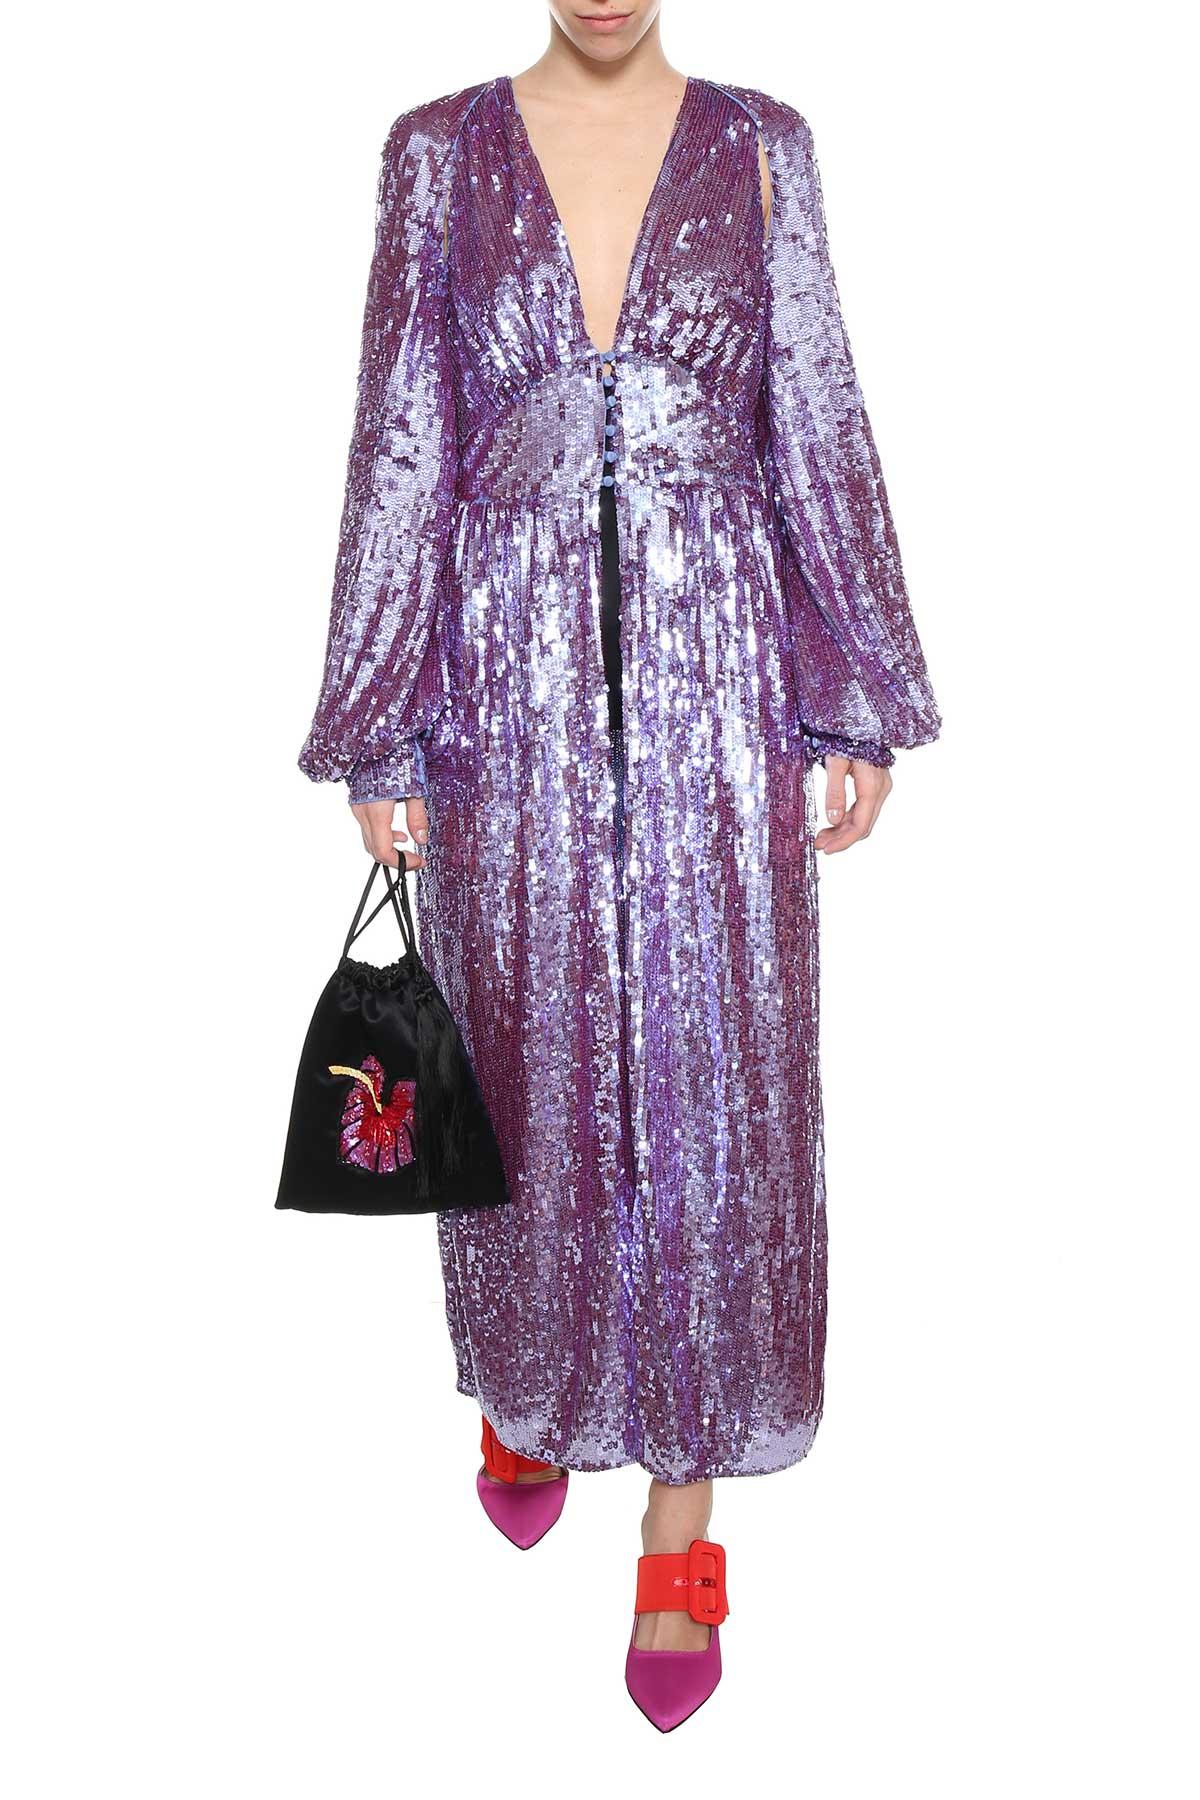 ATTICO Sequins Dress 10614584